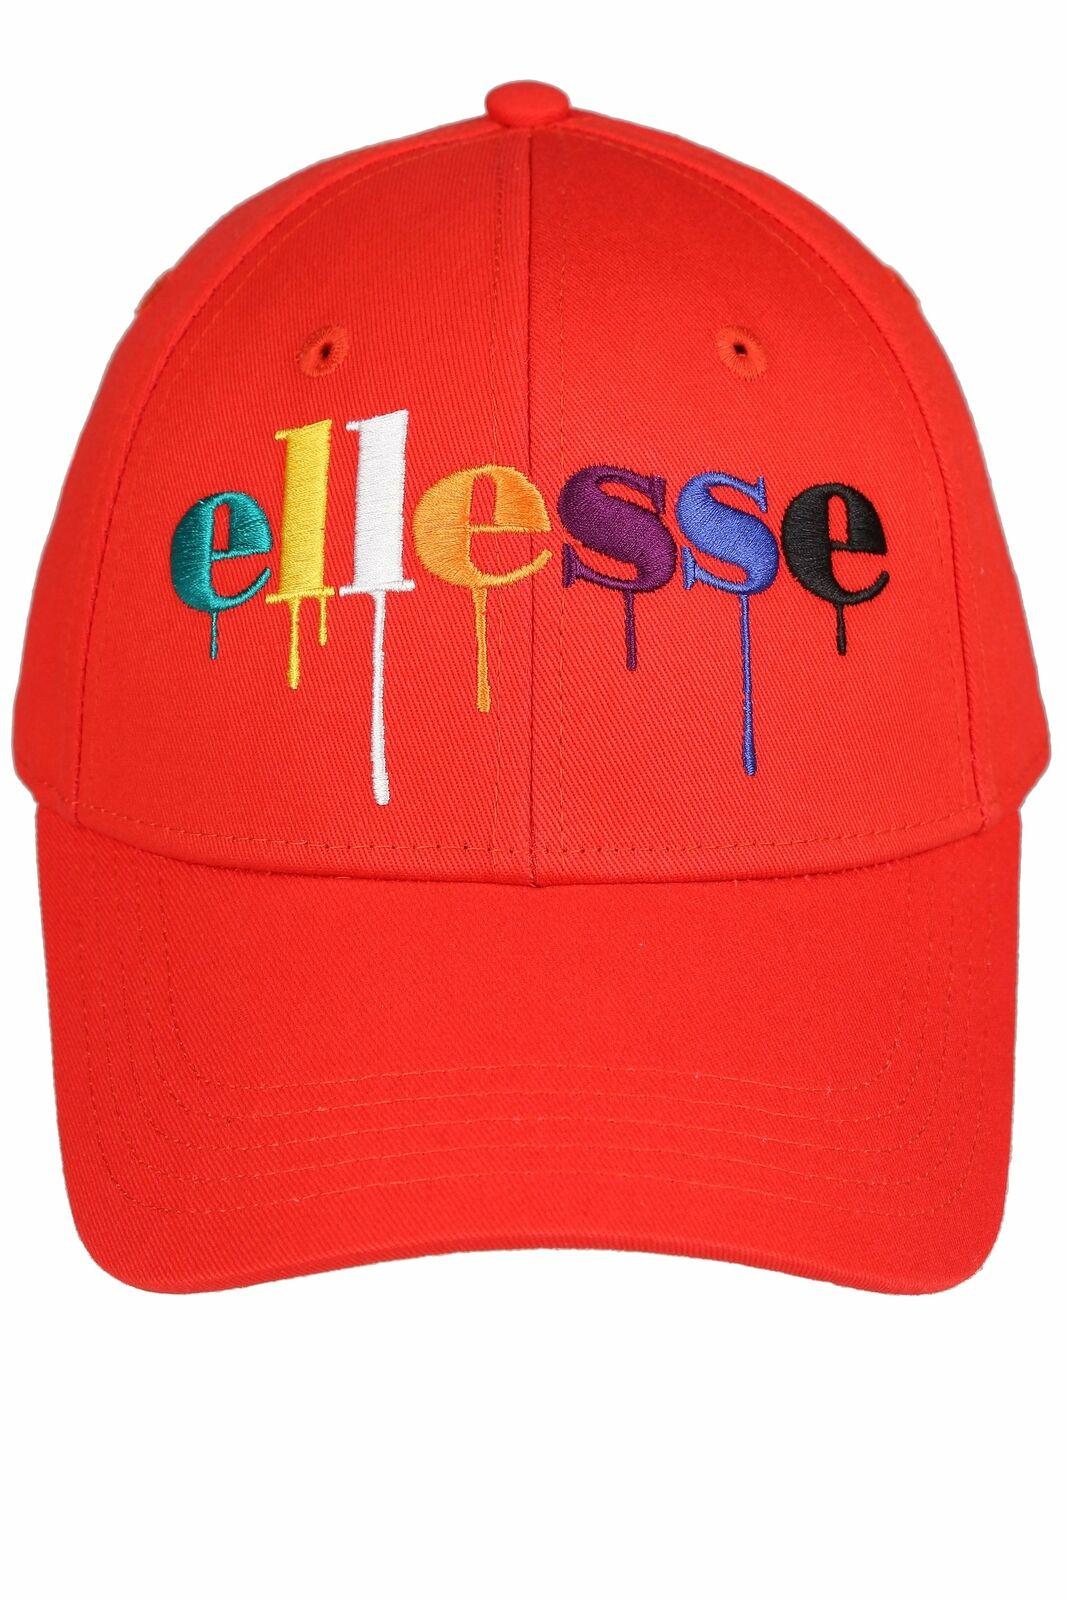 ELLESSE Suzanio Farbe Tropf Baseball Kappe Rot